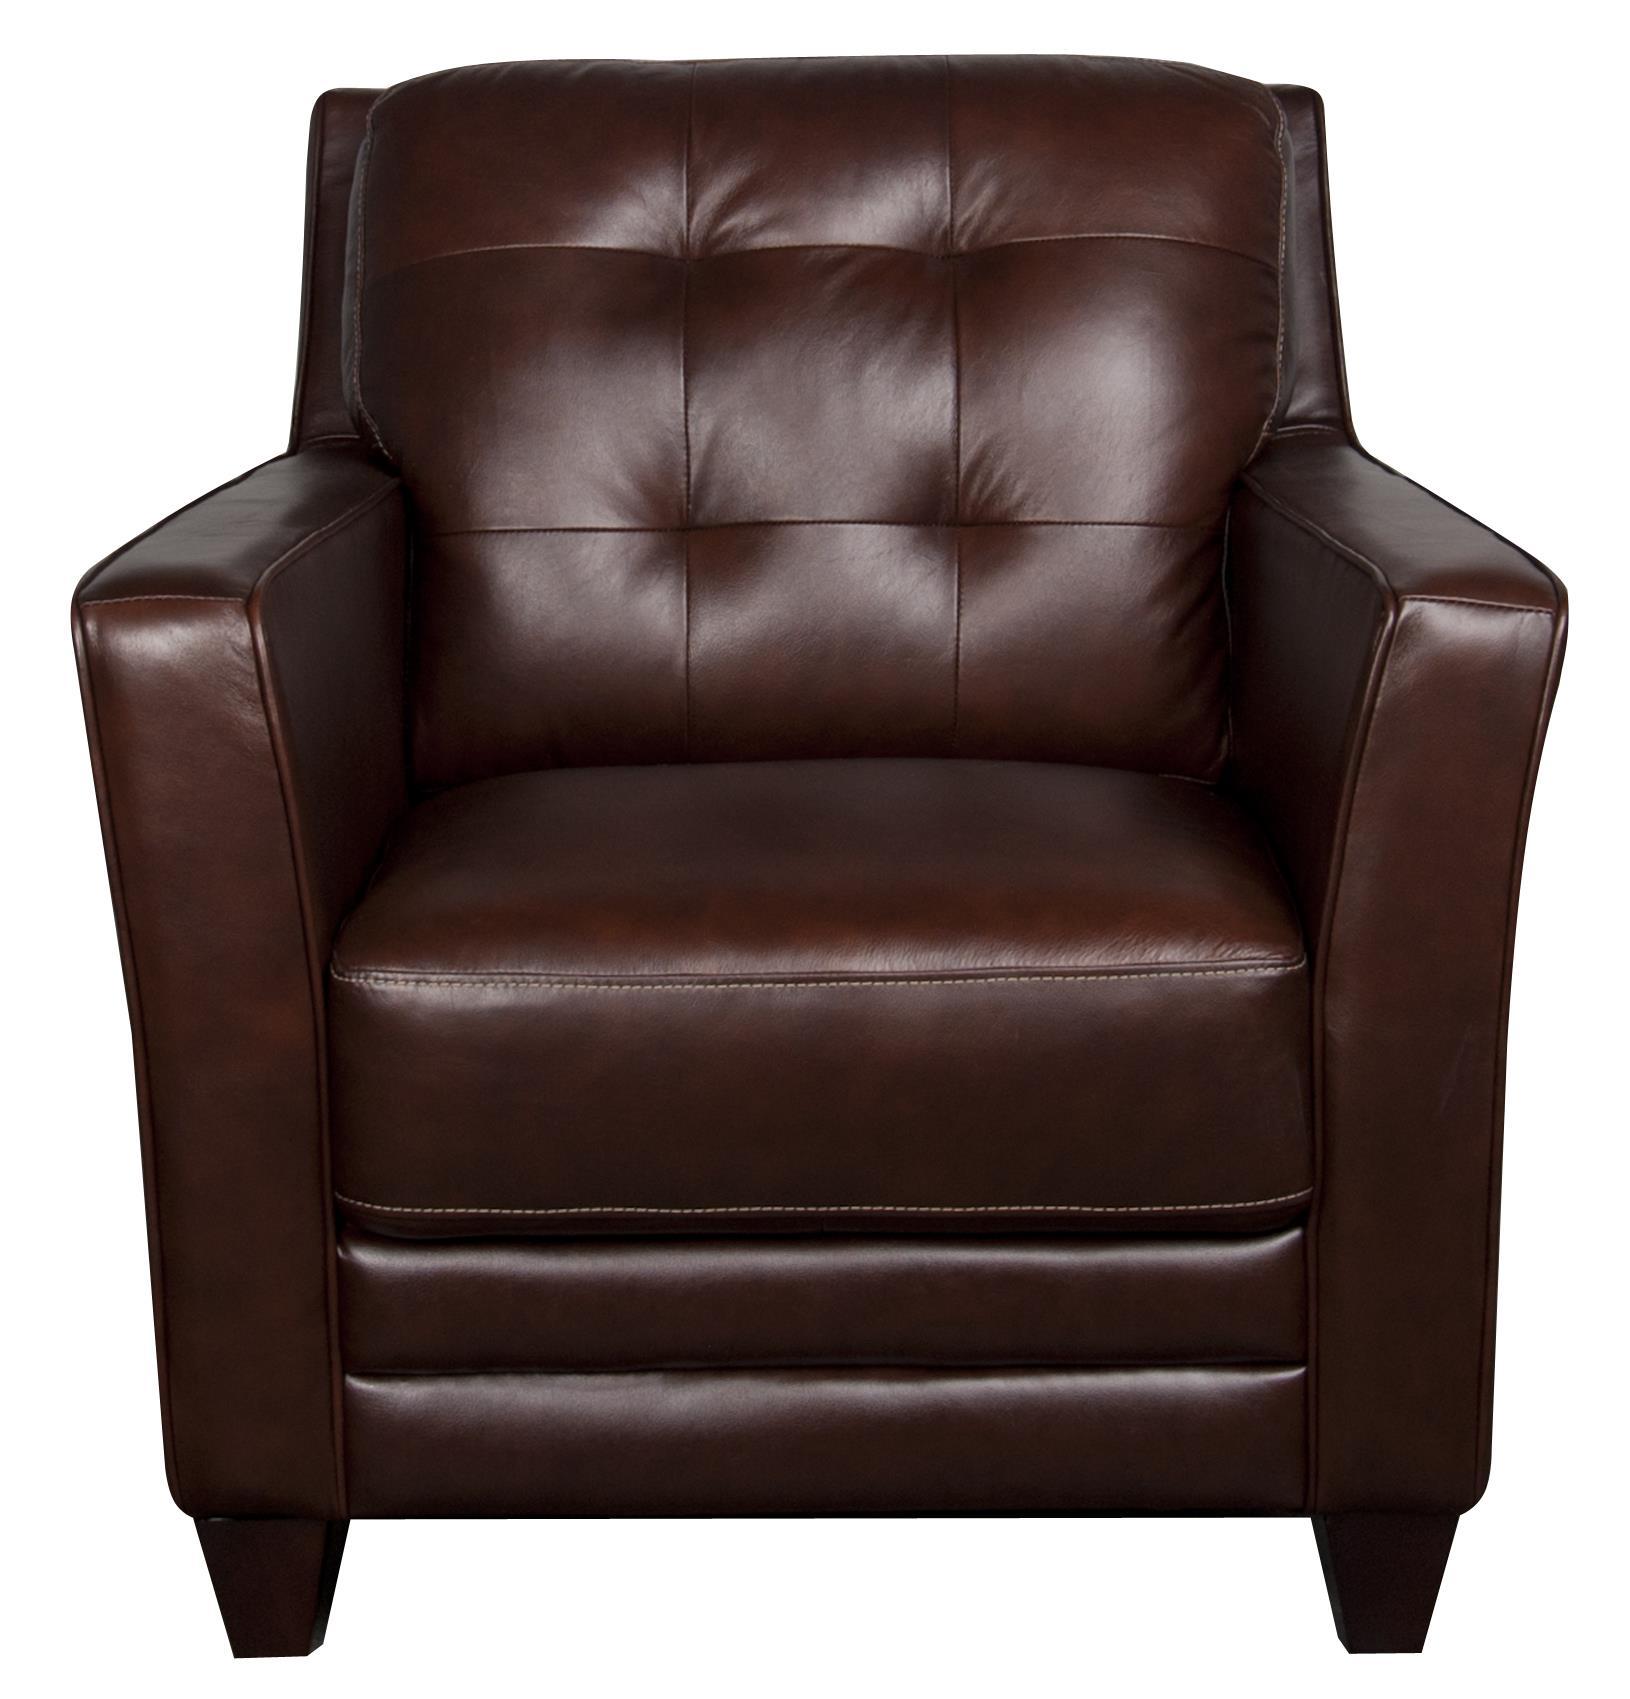 La-Z-Boy Lark Lark Leather-Match* Chair - Item Number: 112954769